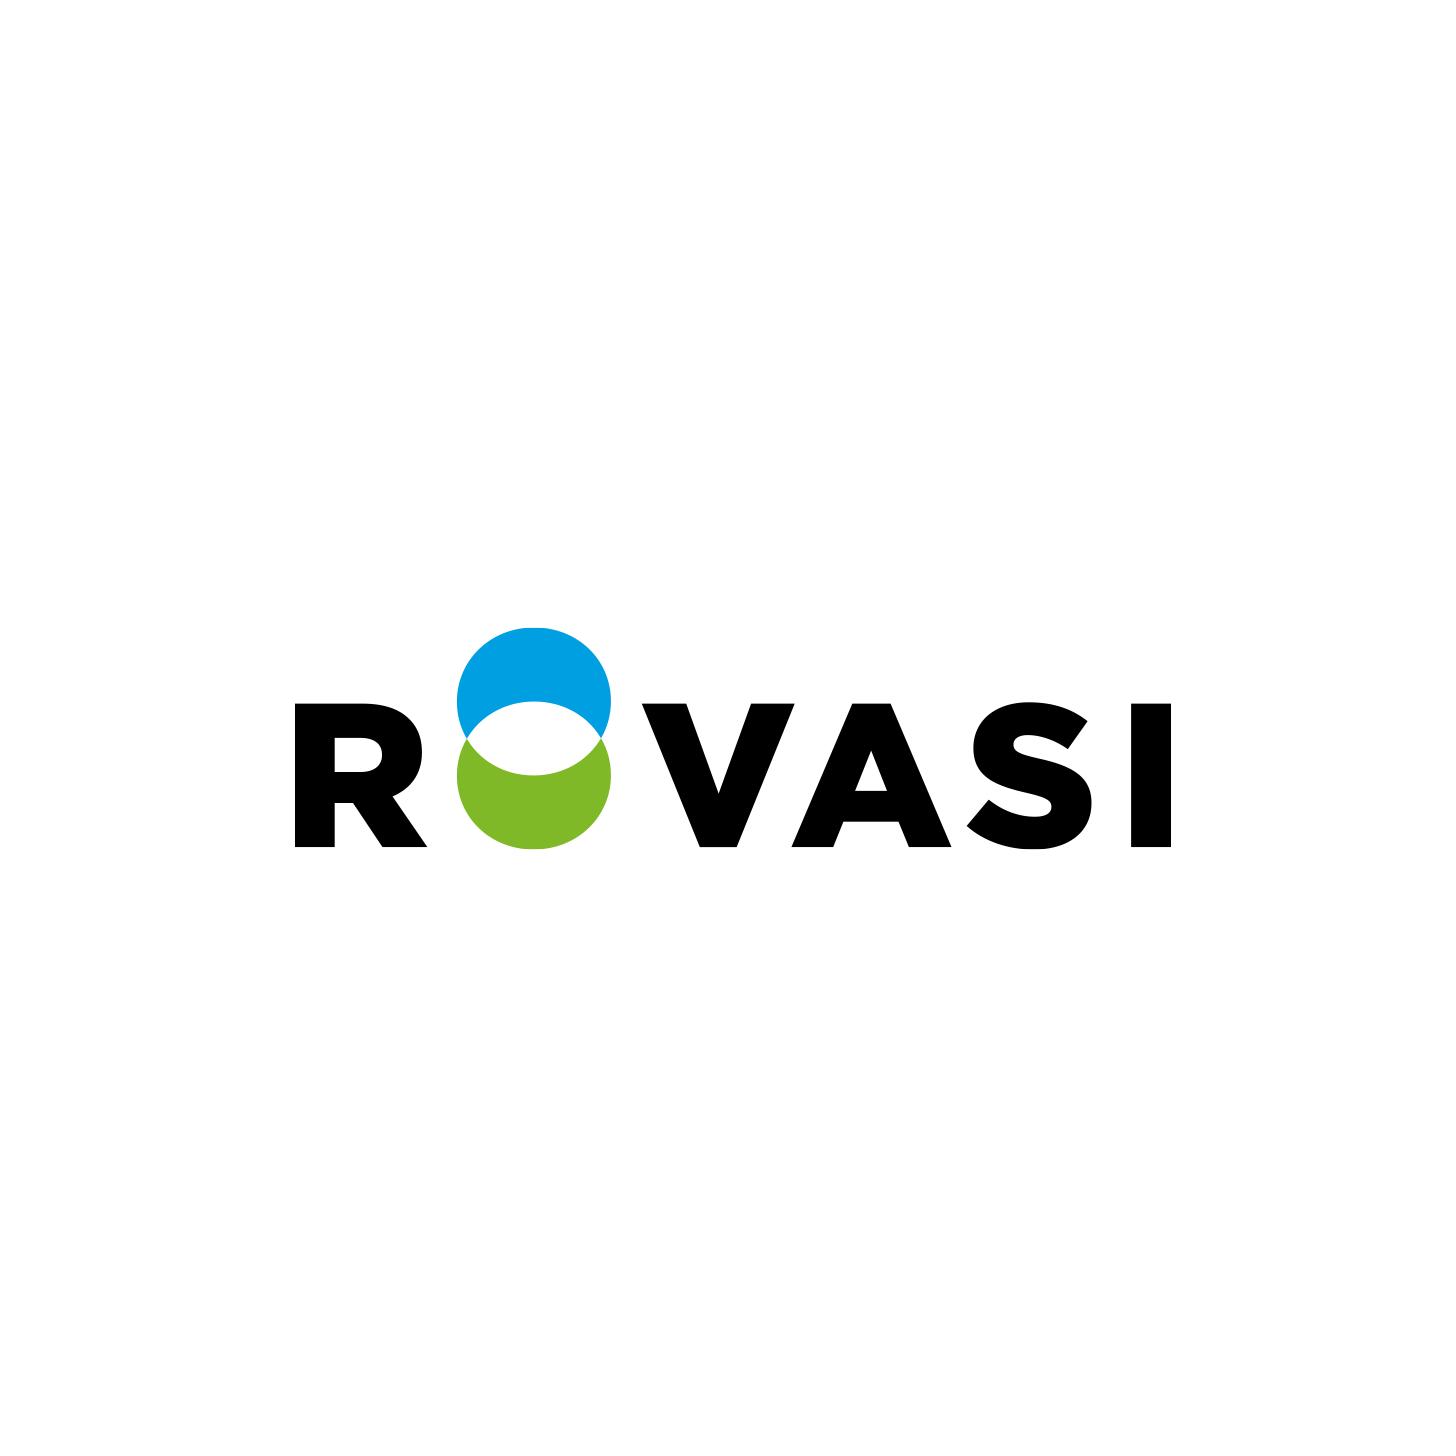 Rovasi